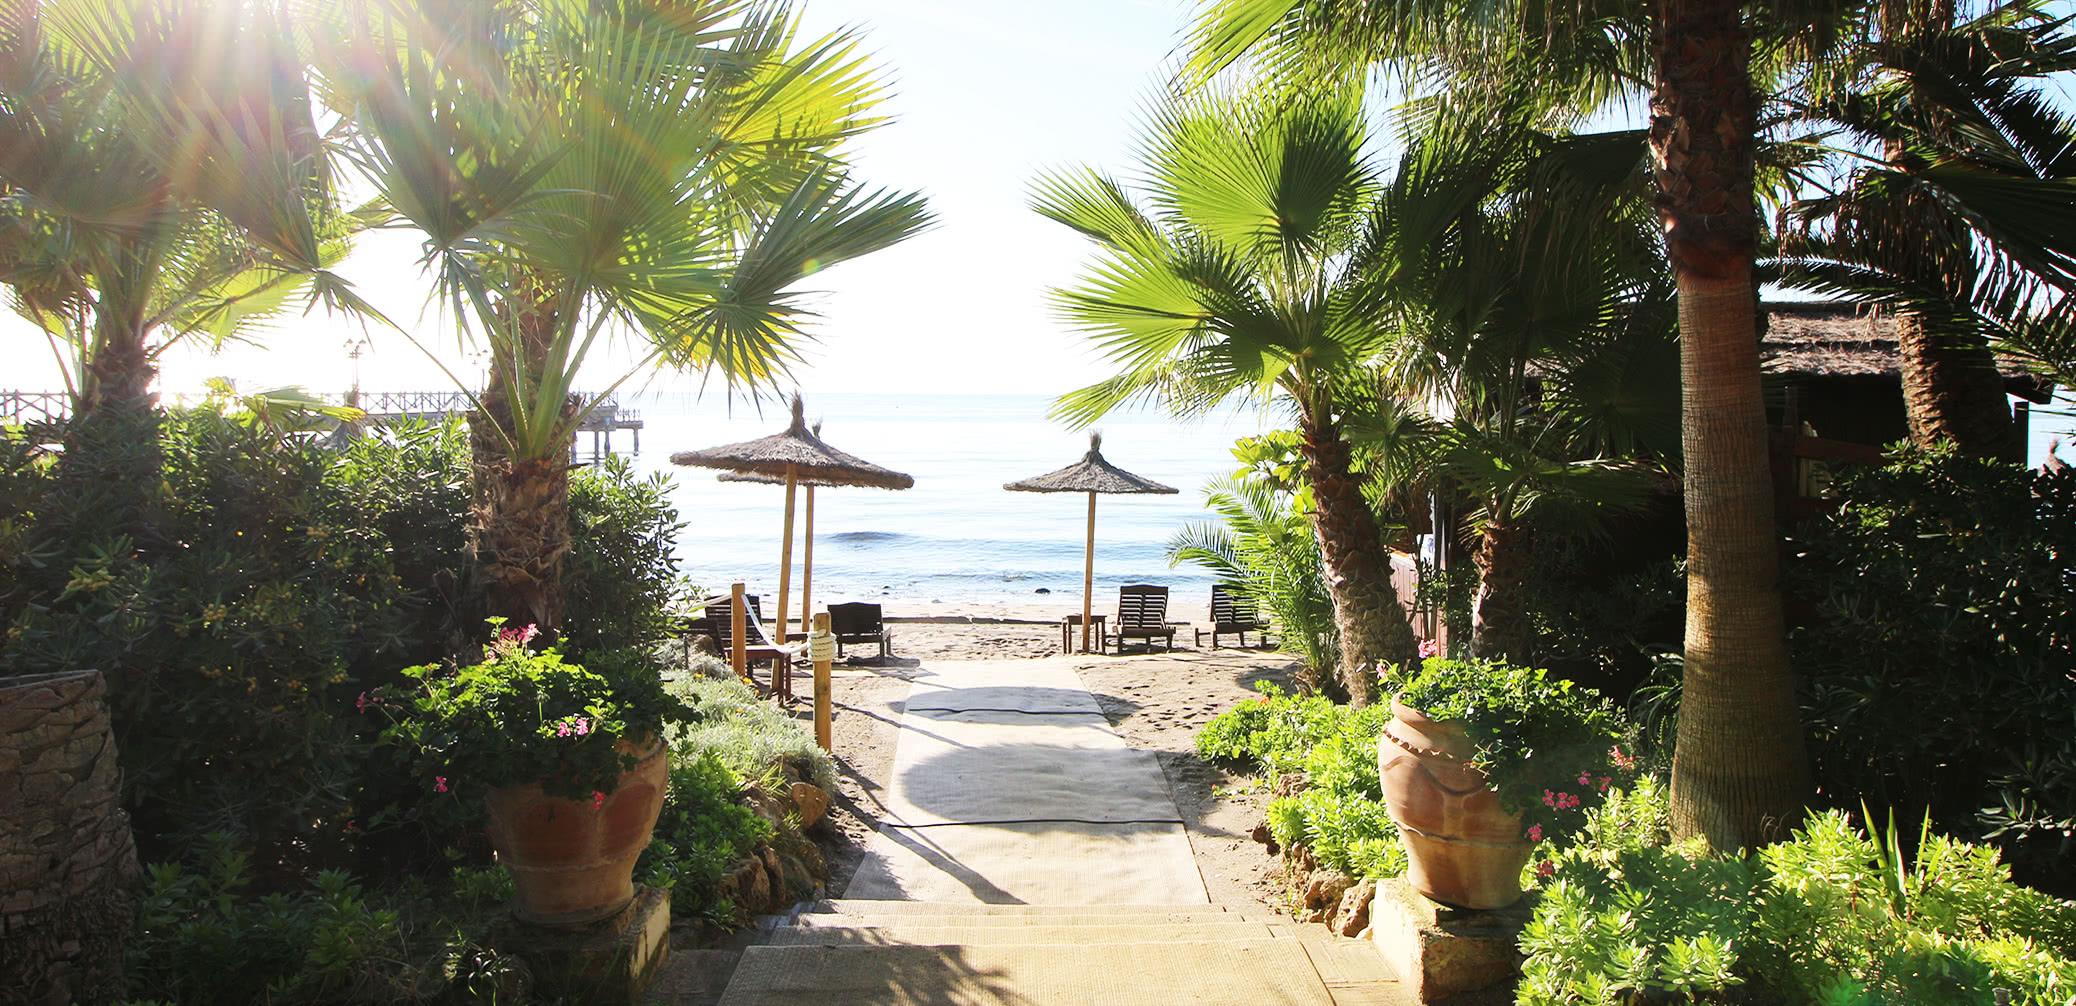 Cheapest Hyatt Hotel In Hawaii: Andaz Maui Vs Grand Vs Regent Vs Centric